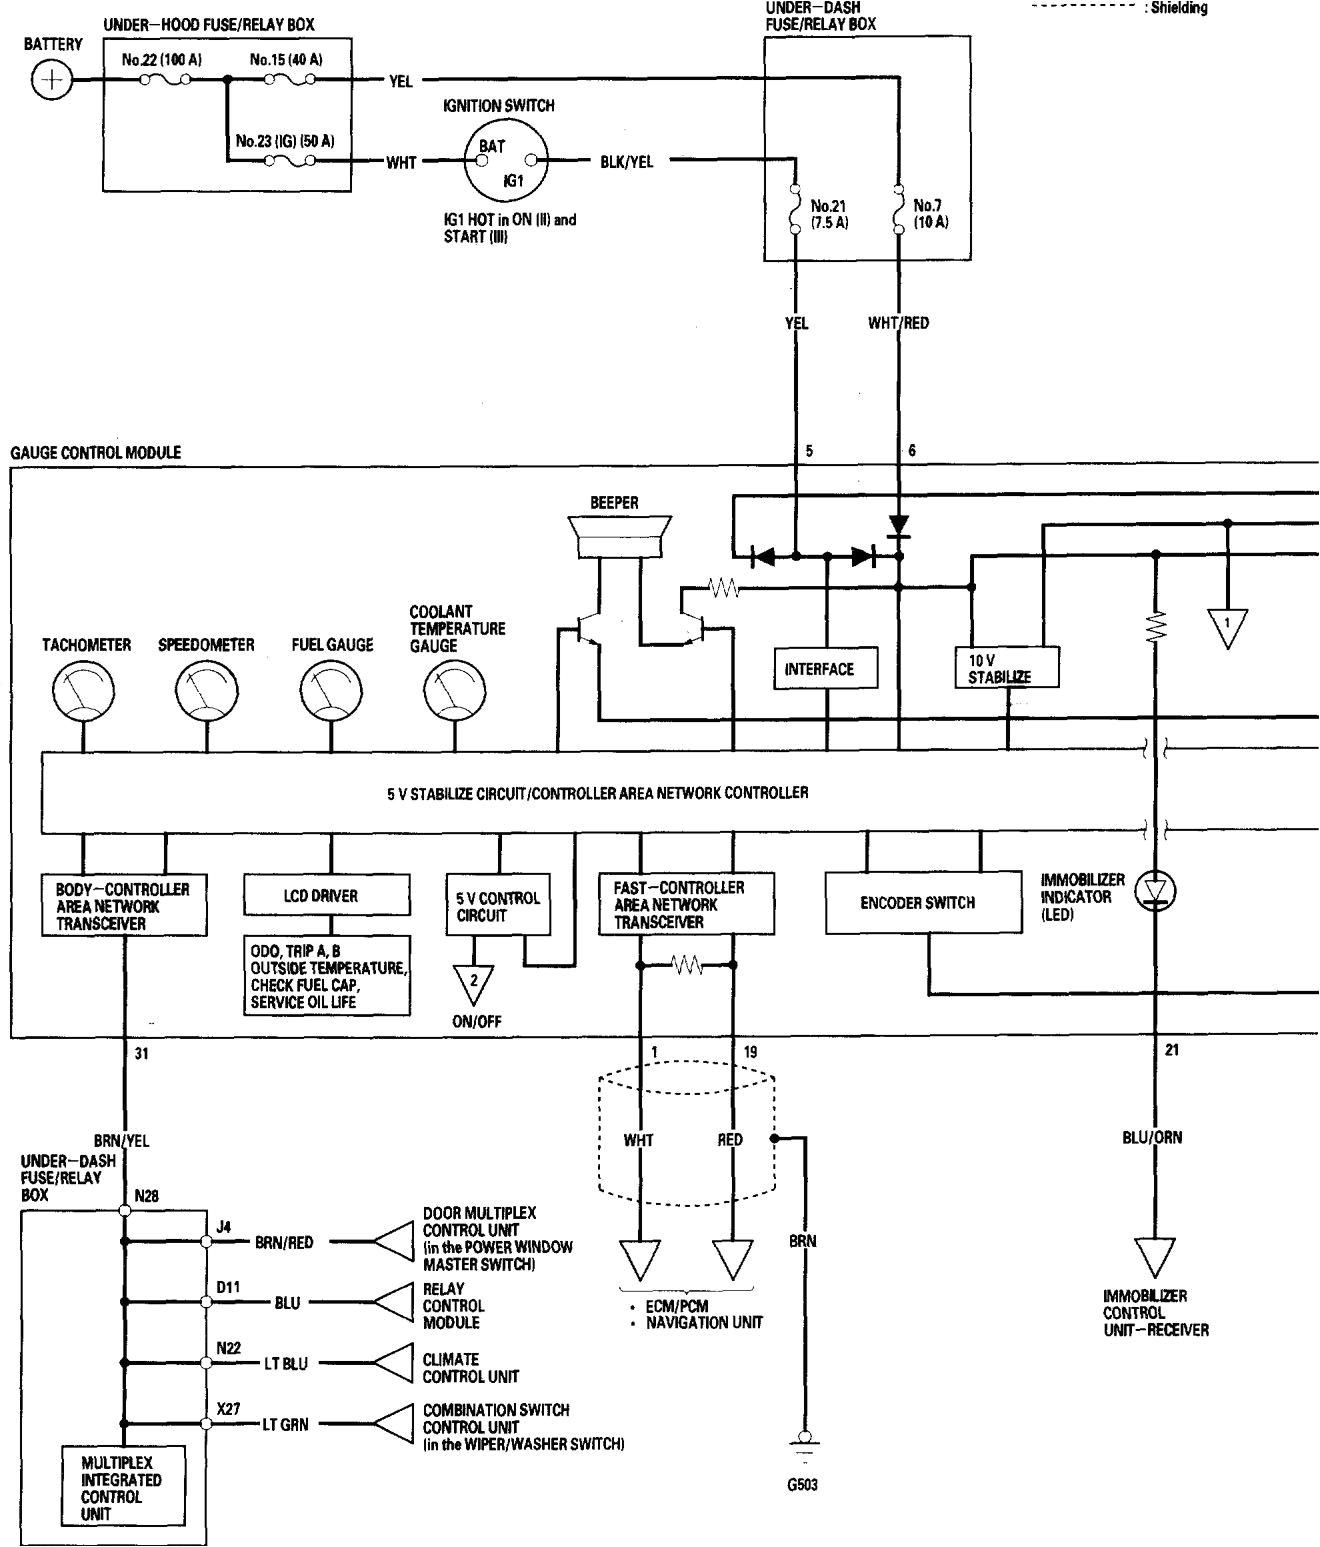 honda accord wiring diagram instrumentation 1 2006 jpg